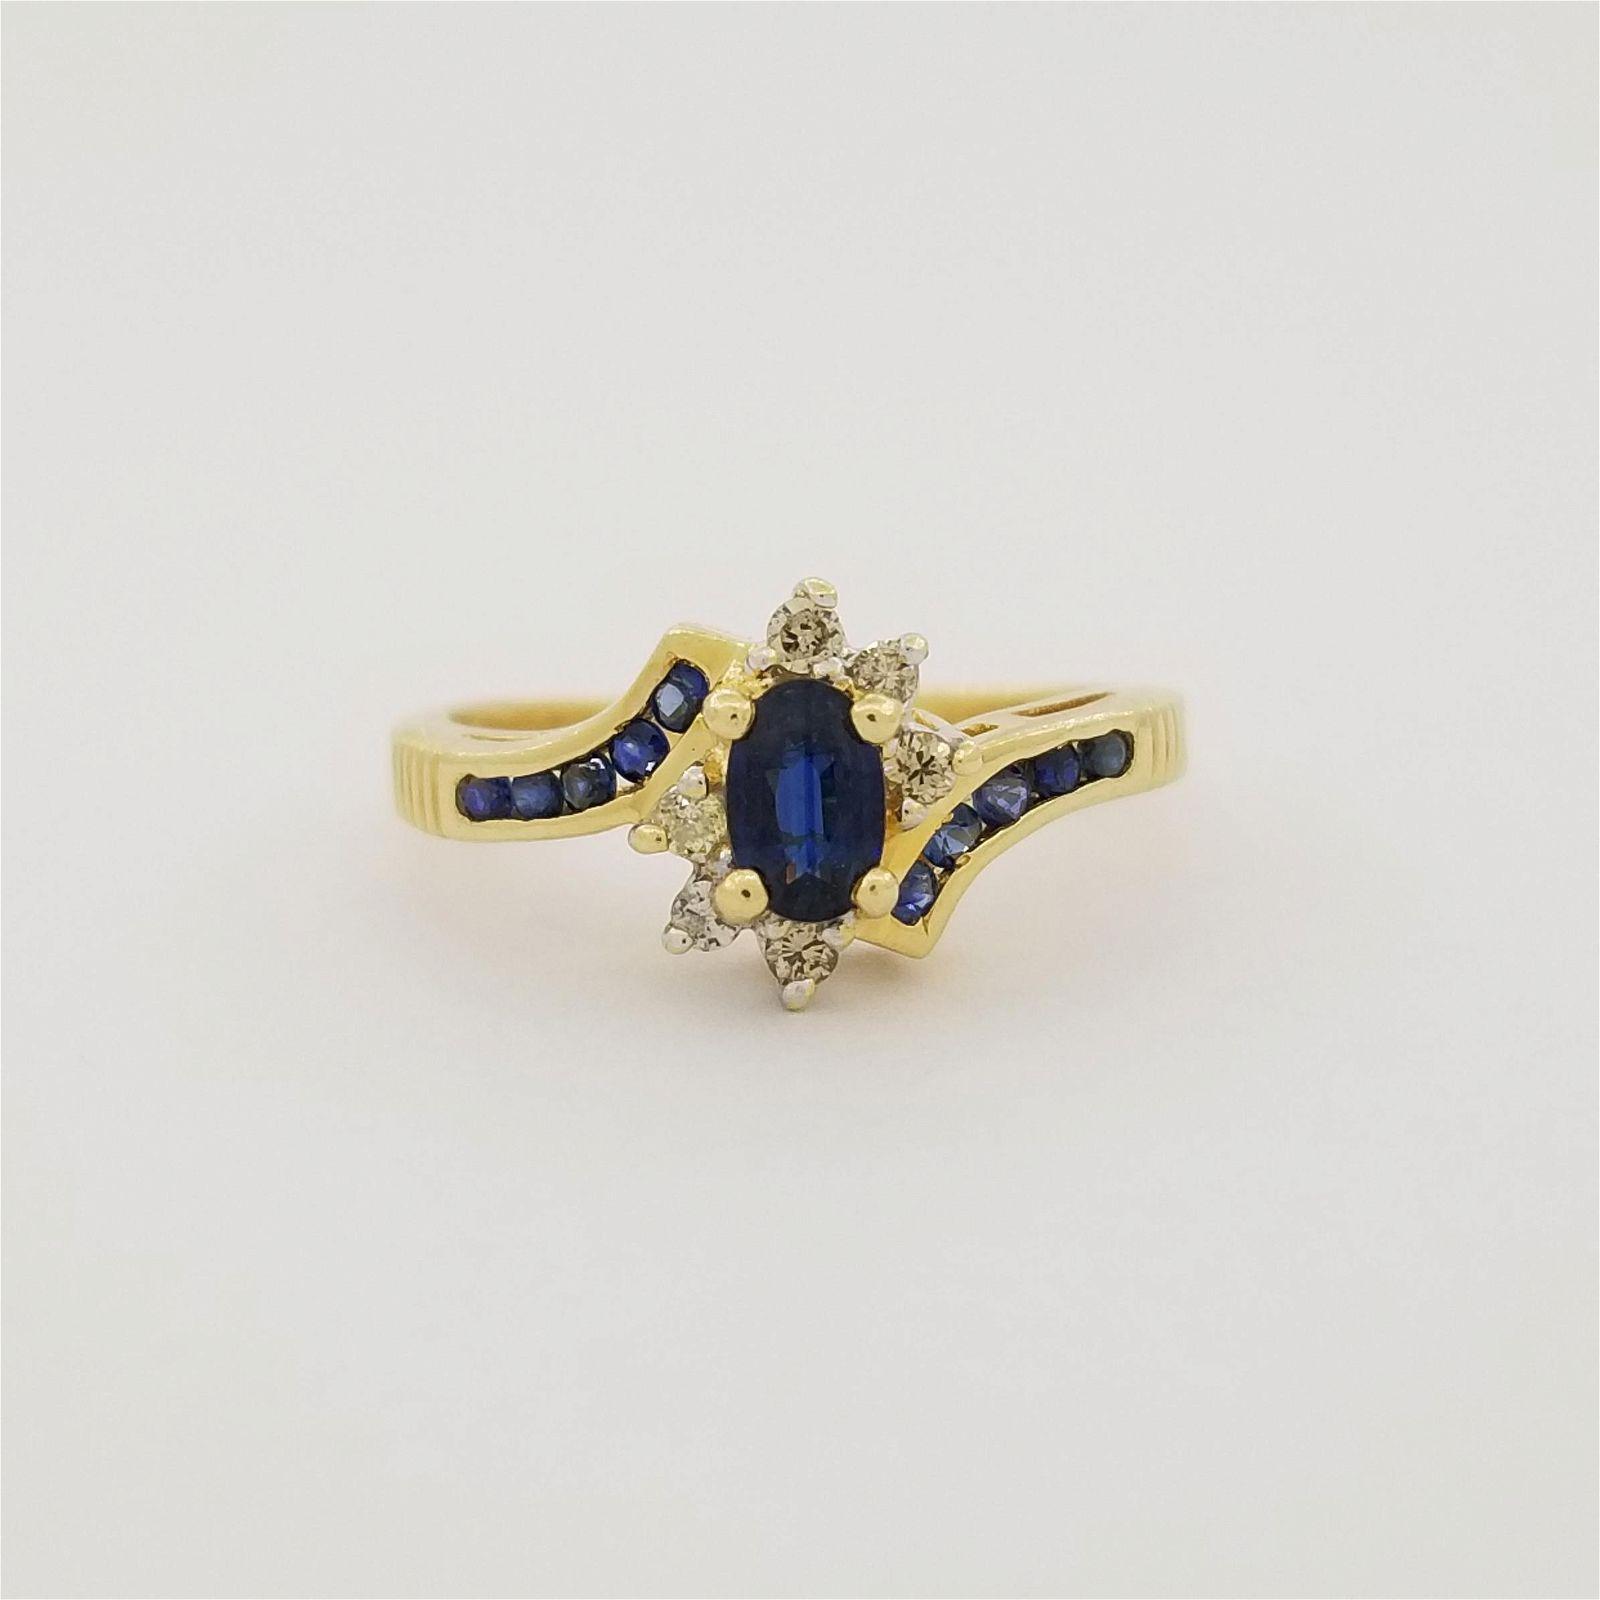 14K Gold Sapphire & Diamond Ring